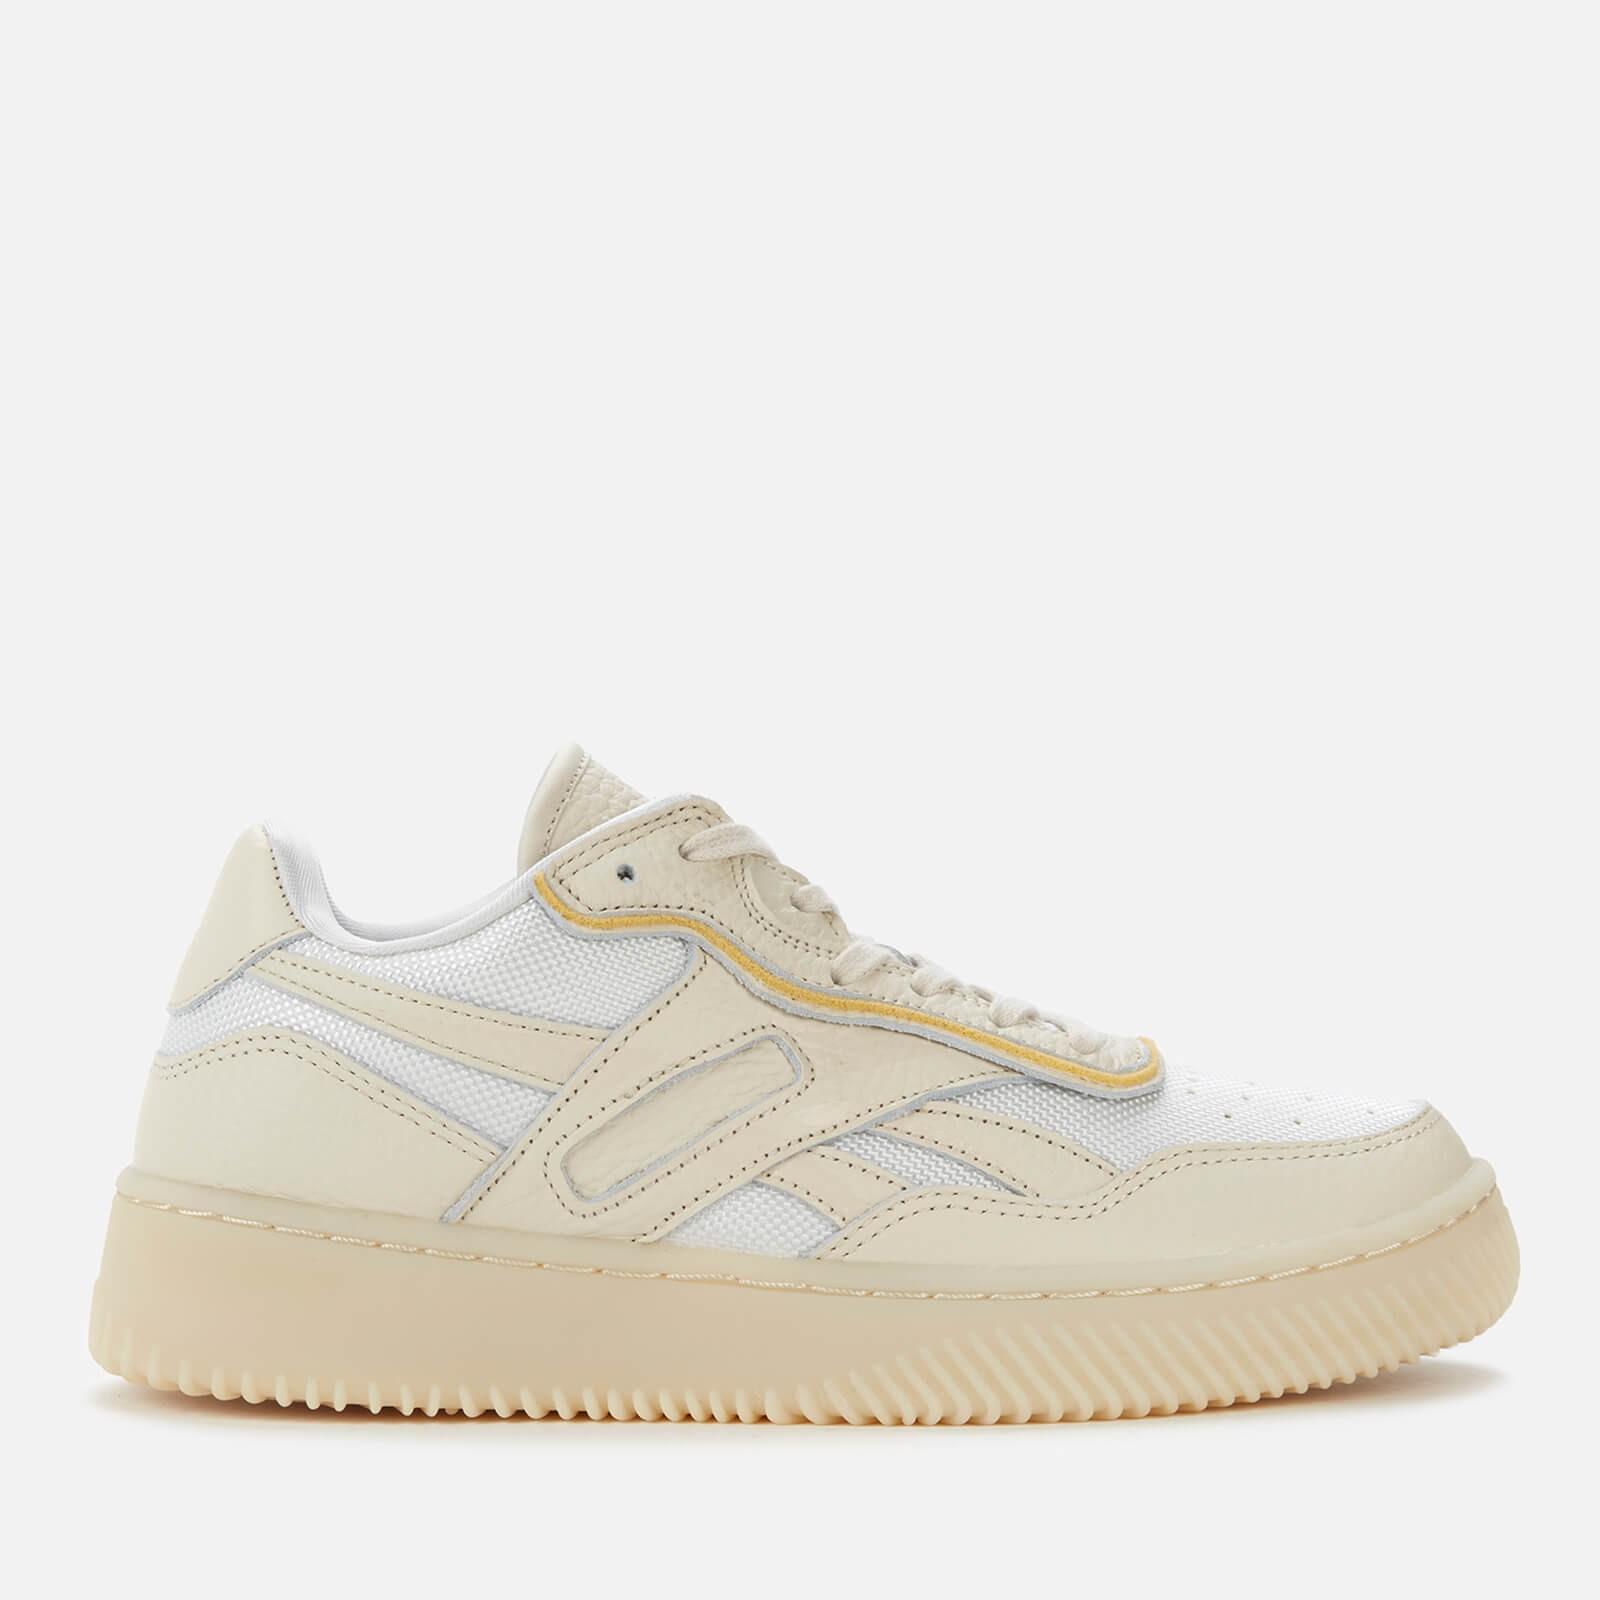 Reebok 锐步 Reebok  Victoria Beckham 联名款 女子休闲运动鞋 纸白 40